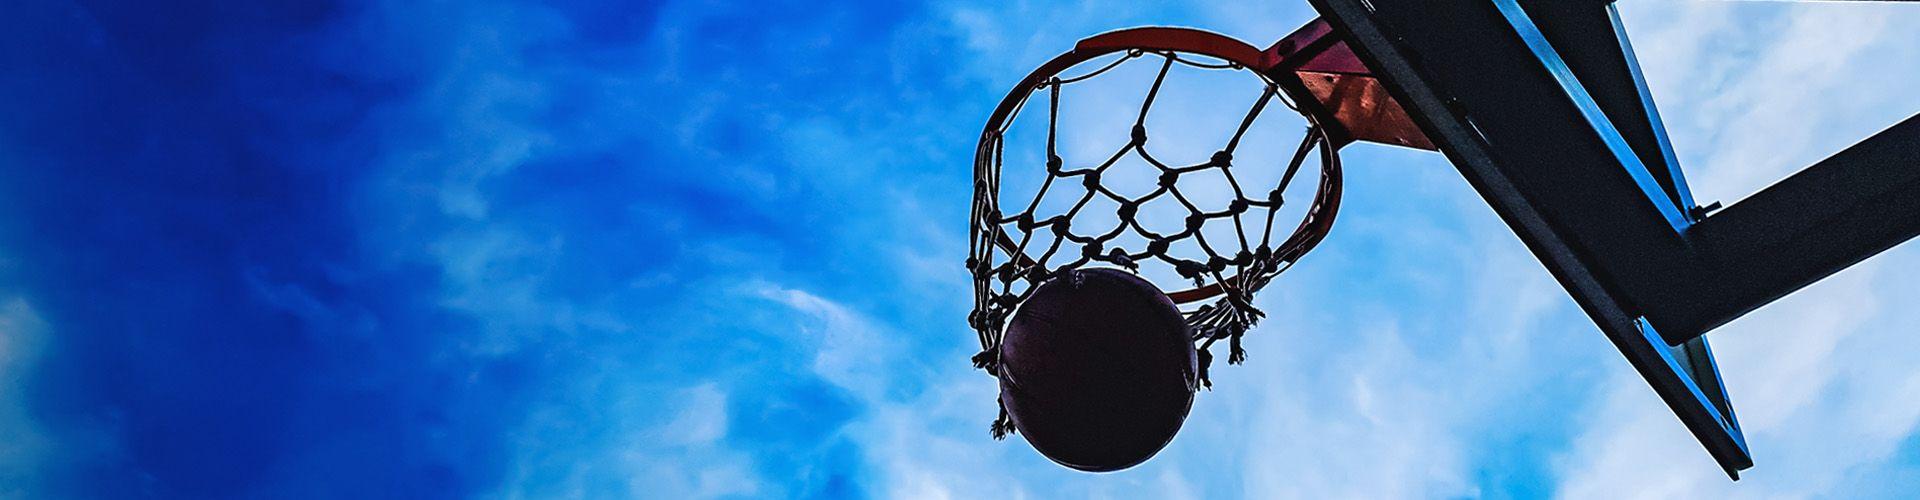 Escuela de Baloncesto C.A. Montemar